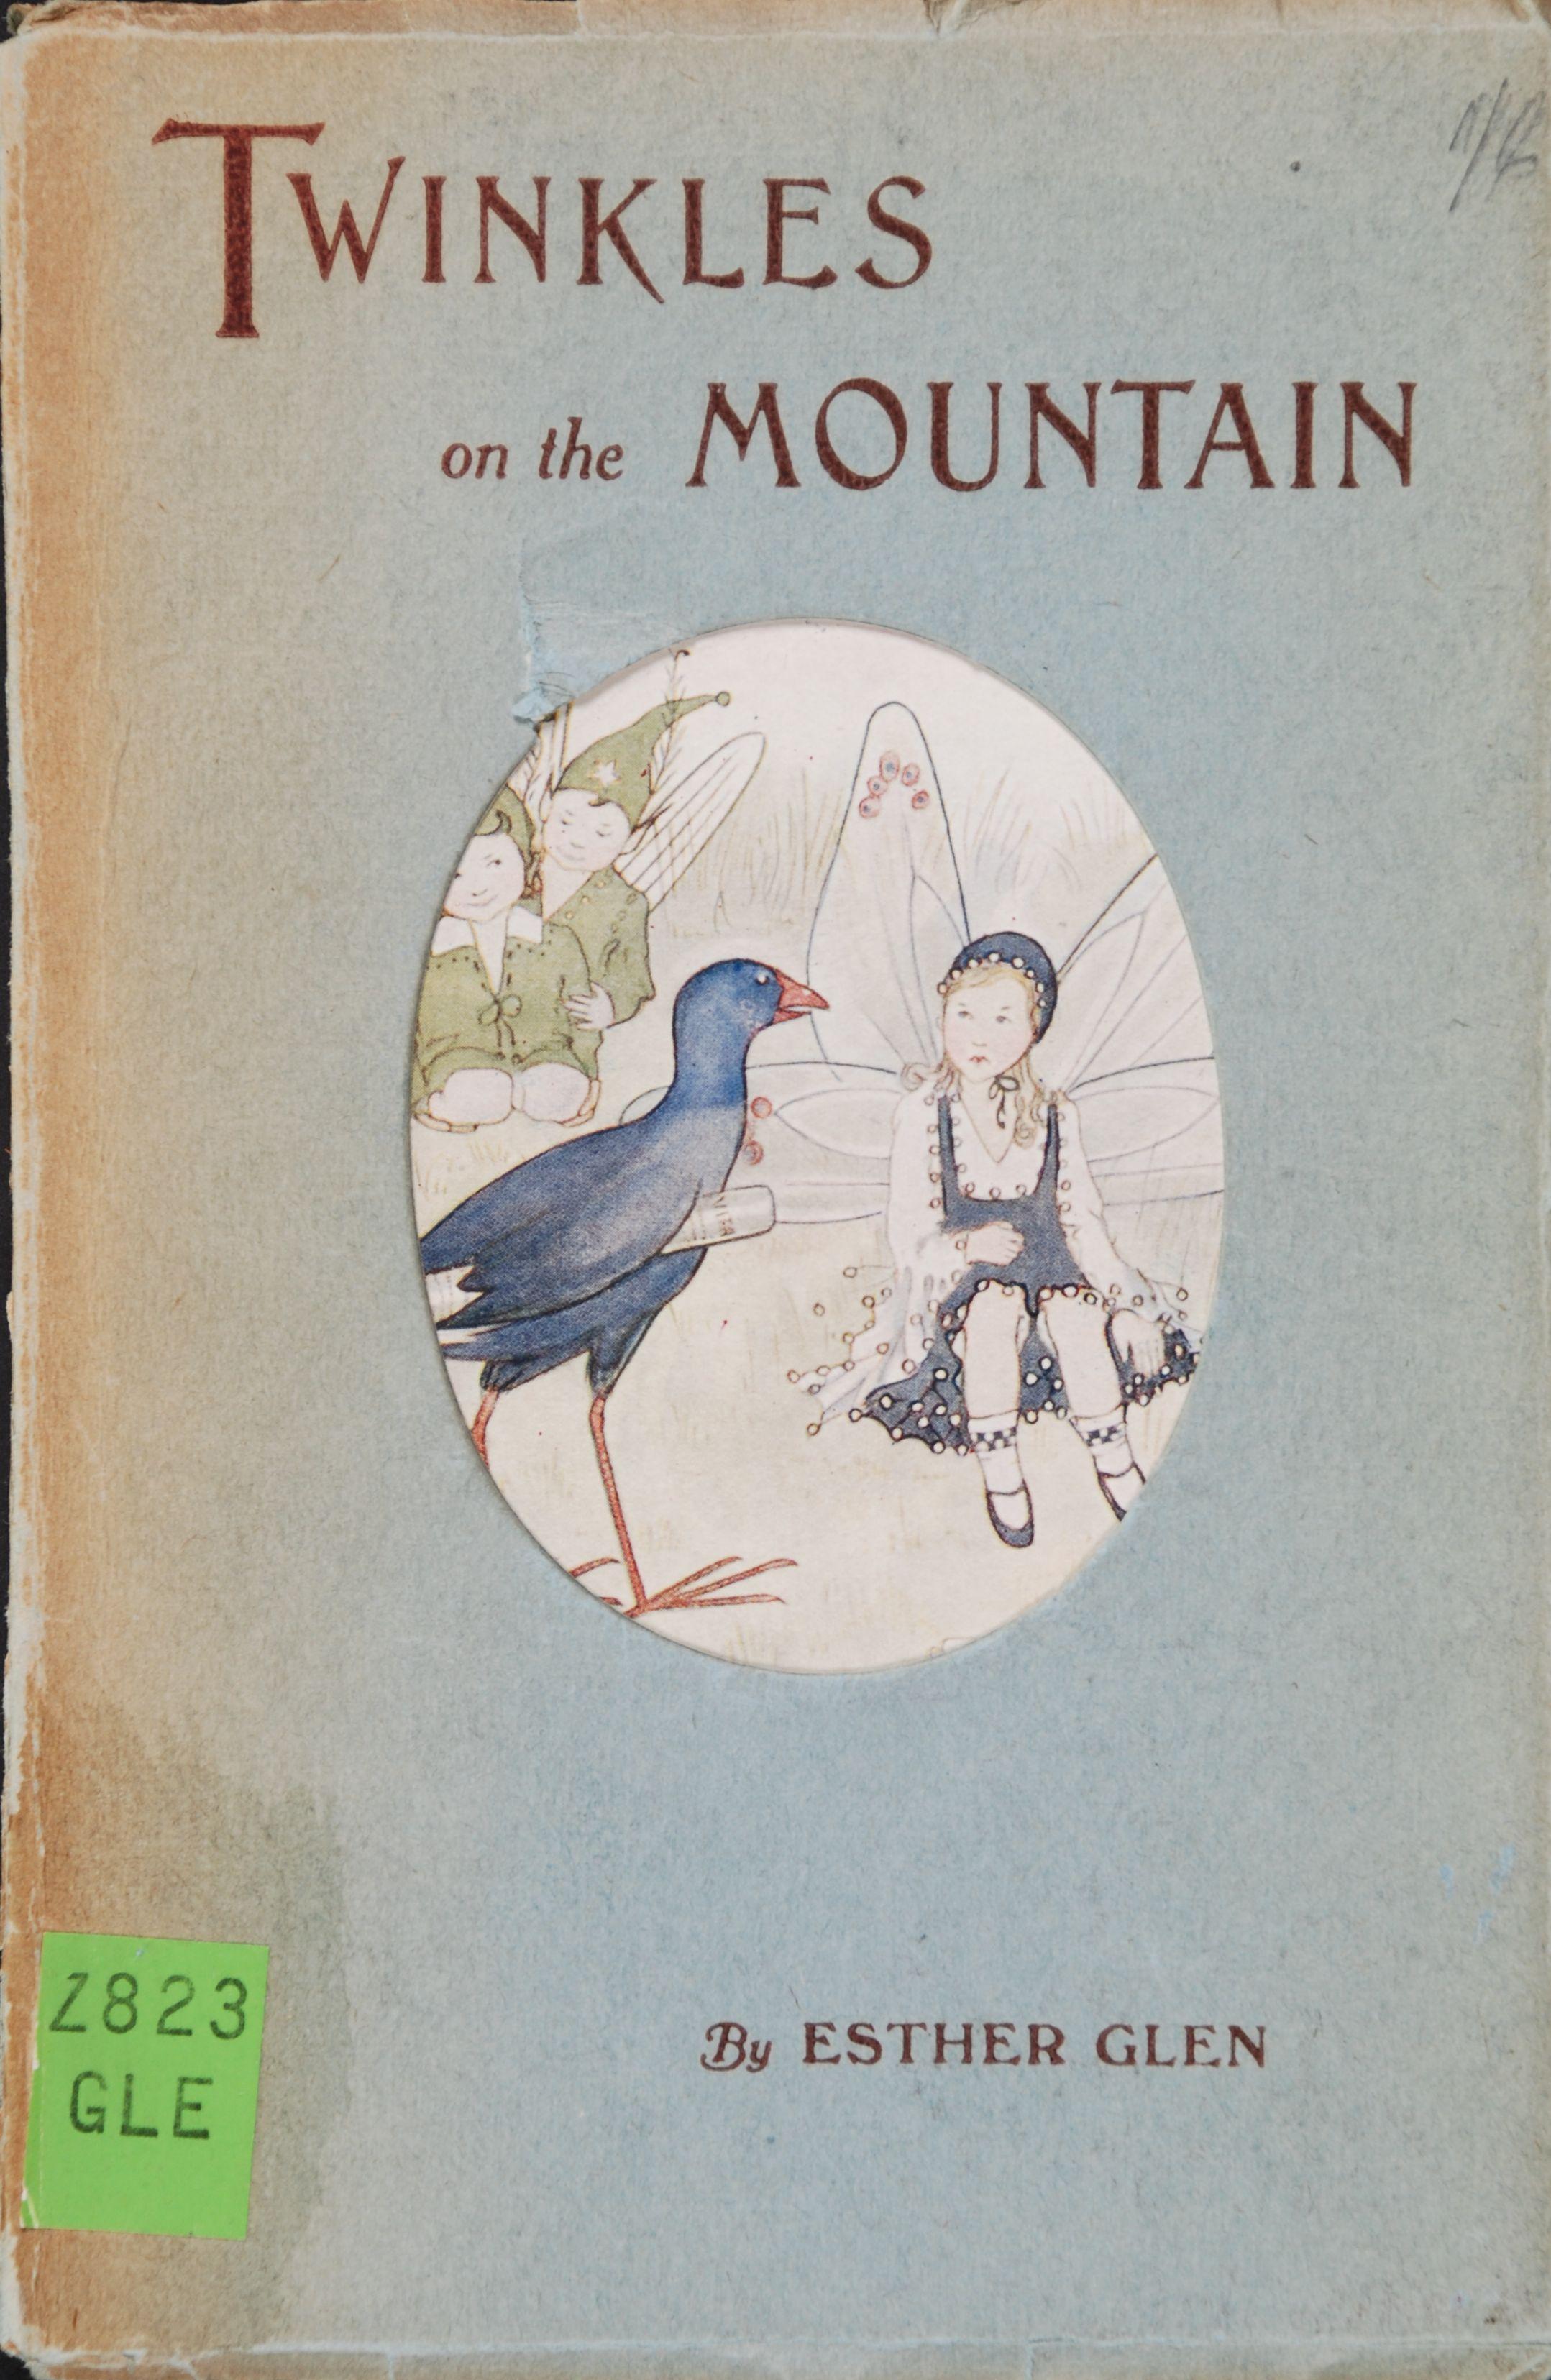 Esther Glen.  Twinkles on the Mountain.  Christchurch: L. M. Isitt Ltd., [1920]